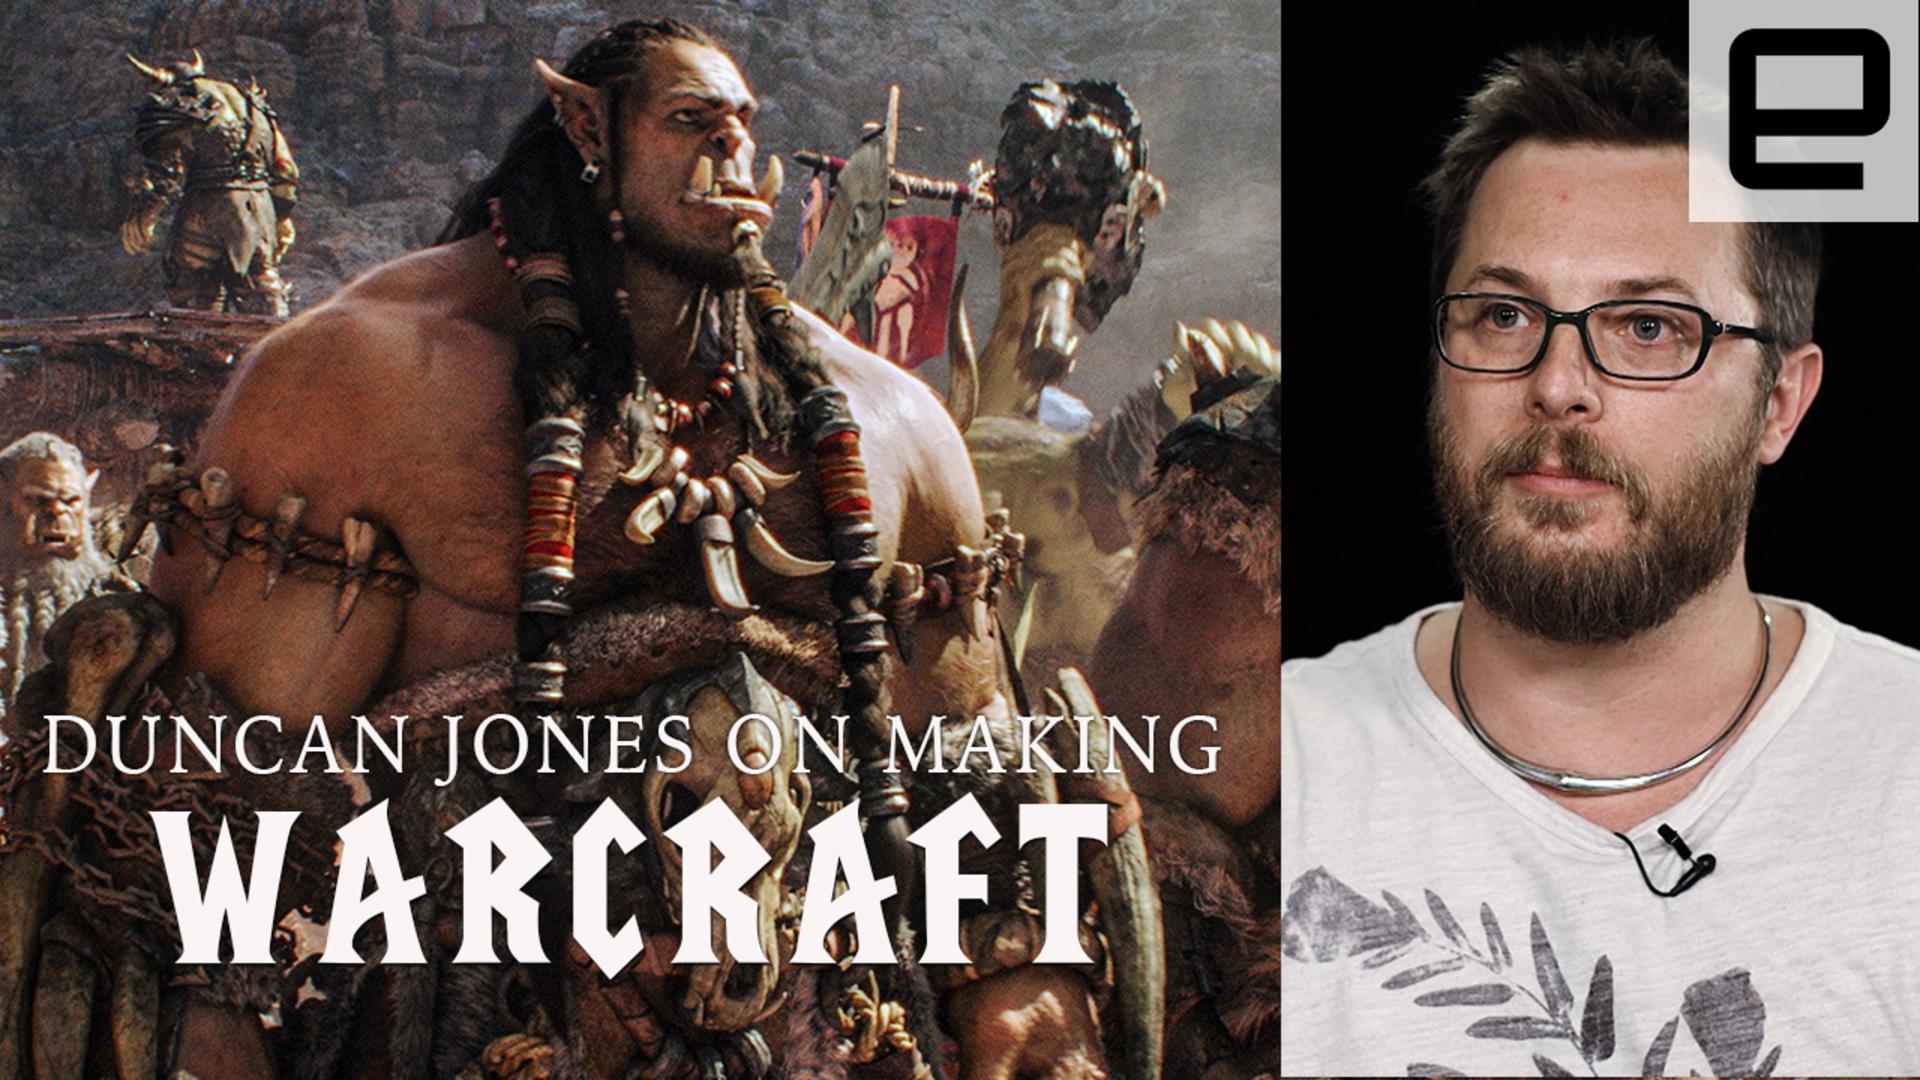 Duncan Jones on making 'Warcraft'